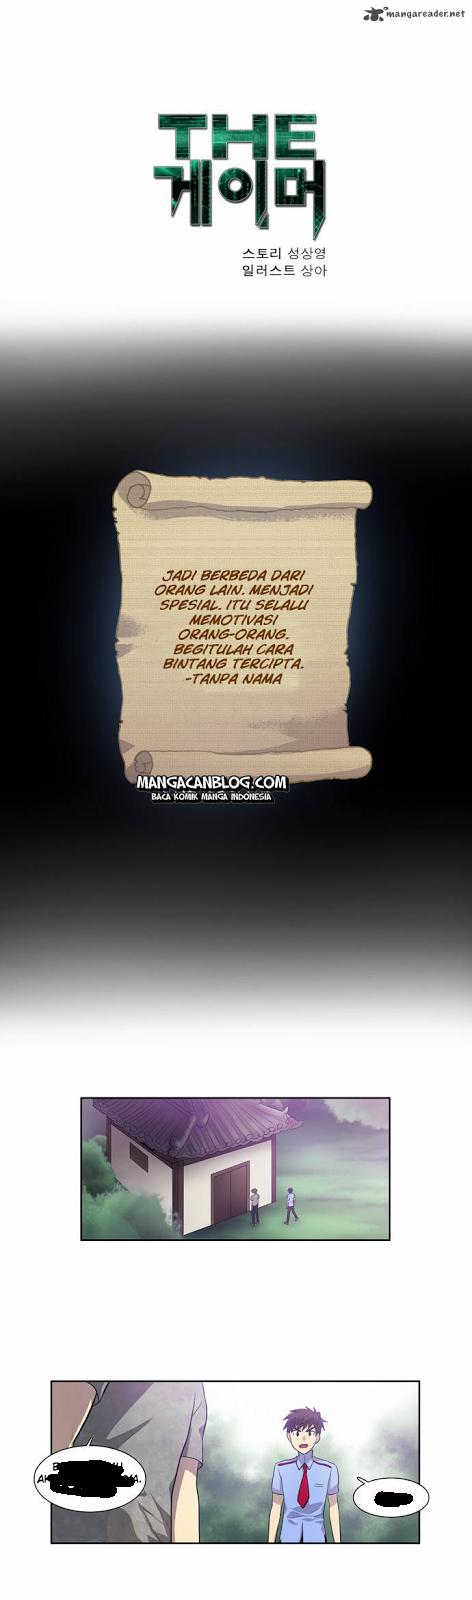 Dilarang COPAS - situs resmi www.mangacanblog.com - Komik the gamer 039 - chapter 39 40 Indonesia the gamer 039 - chapter 39 Terbaru |Baca Manga Komik Indonesia|Mangacan